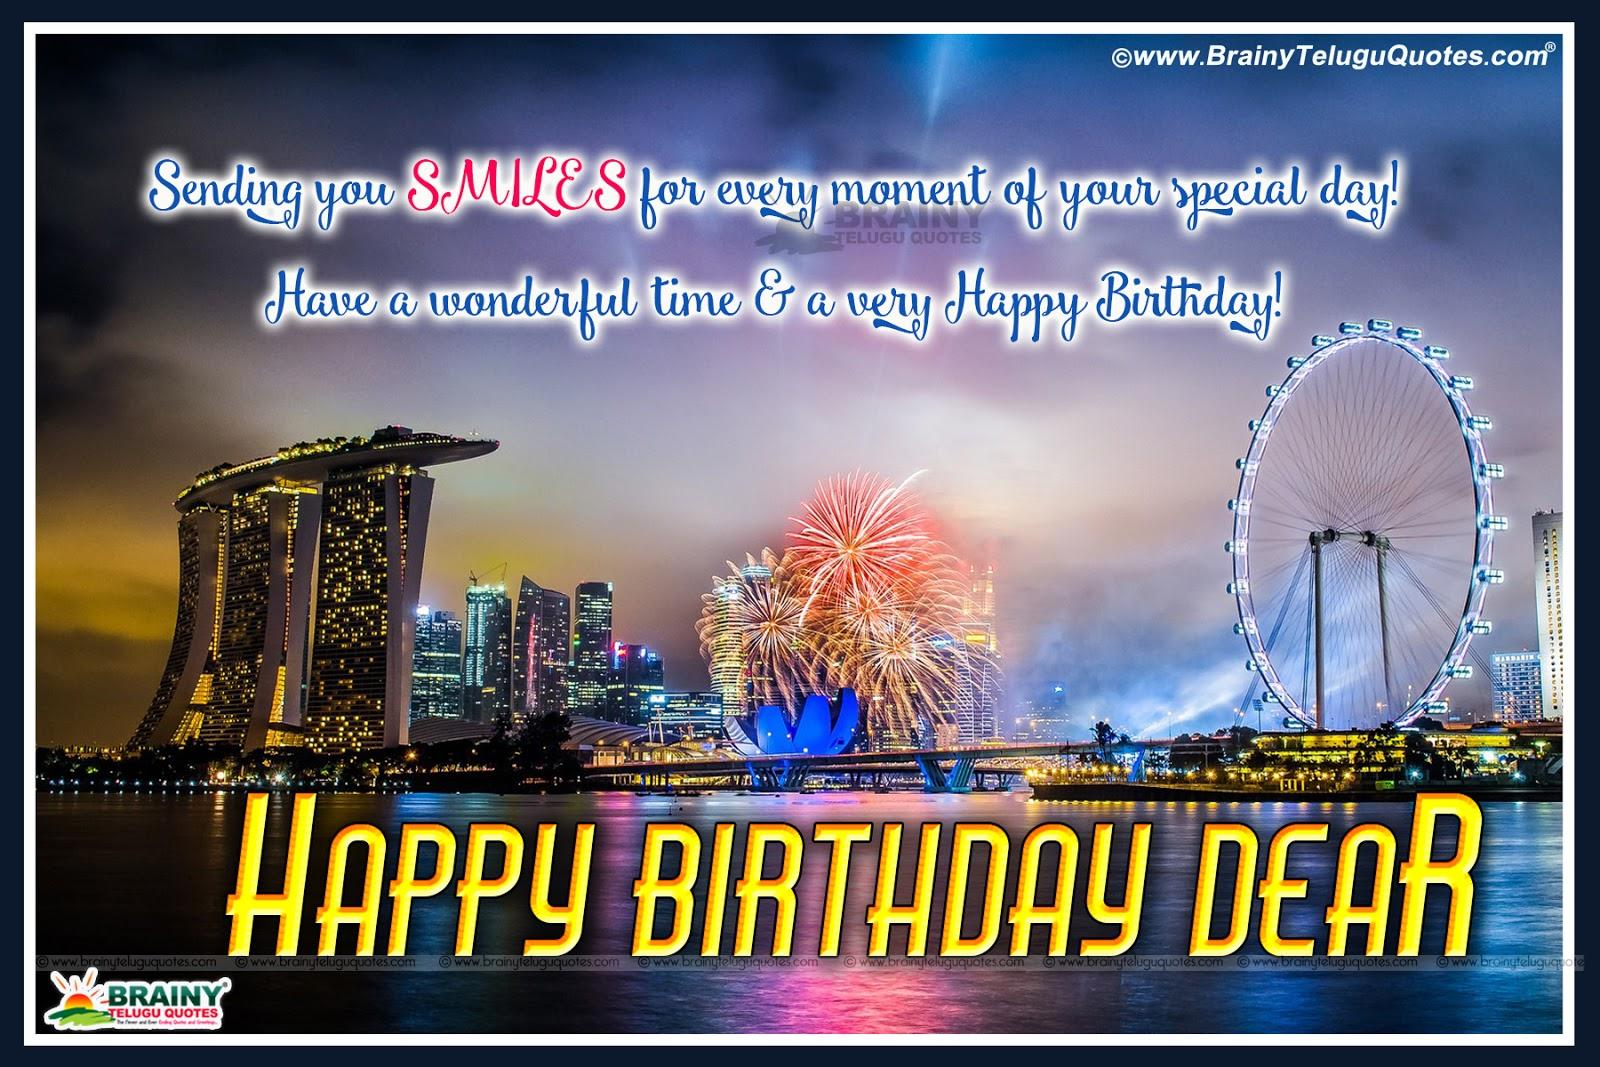 Happy Birthday Wishes For A Friend Best Birthday Wishes